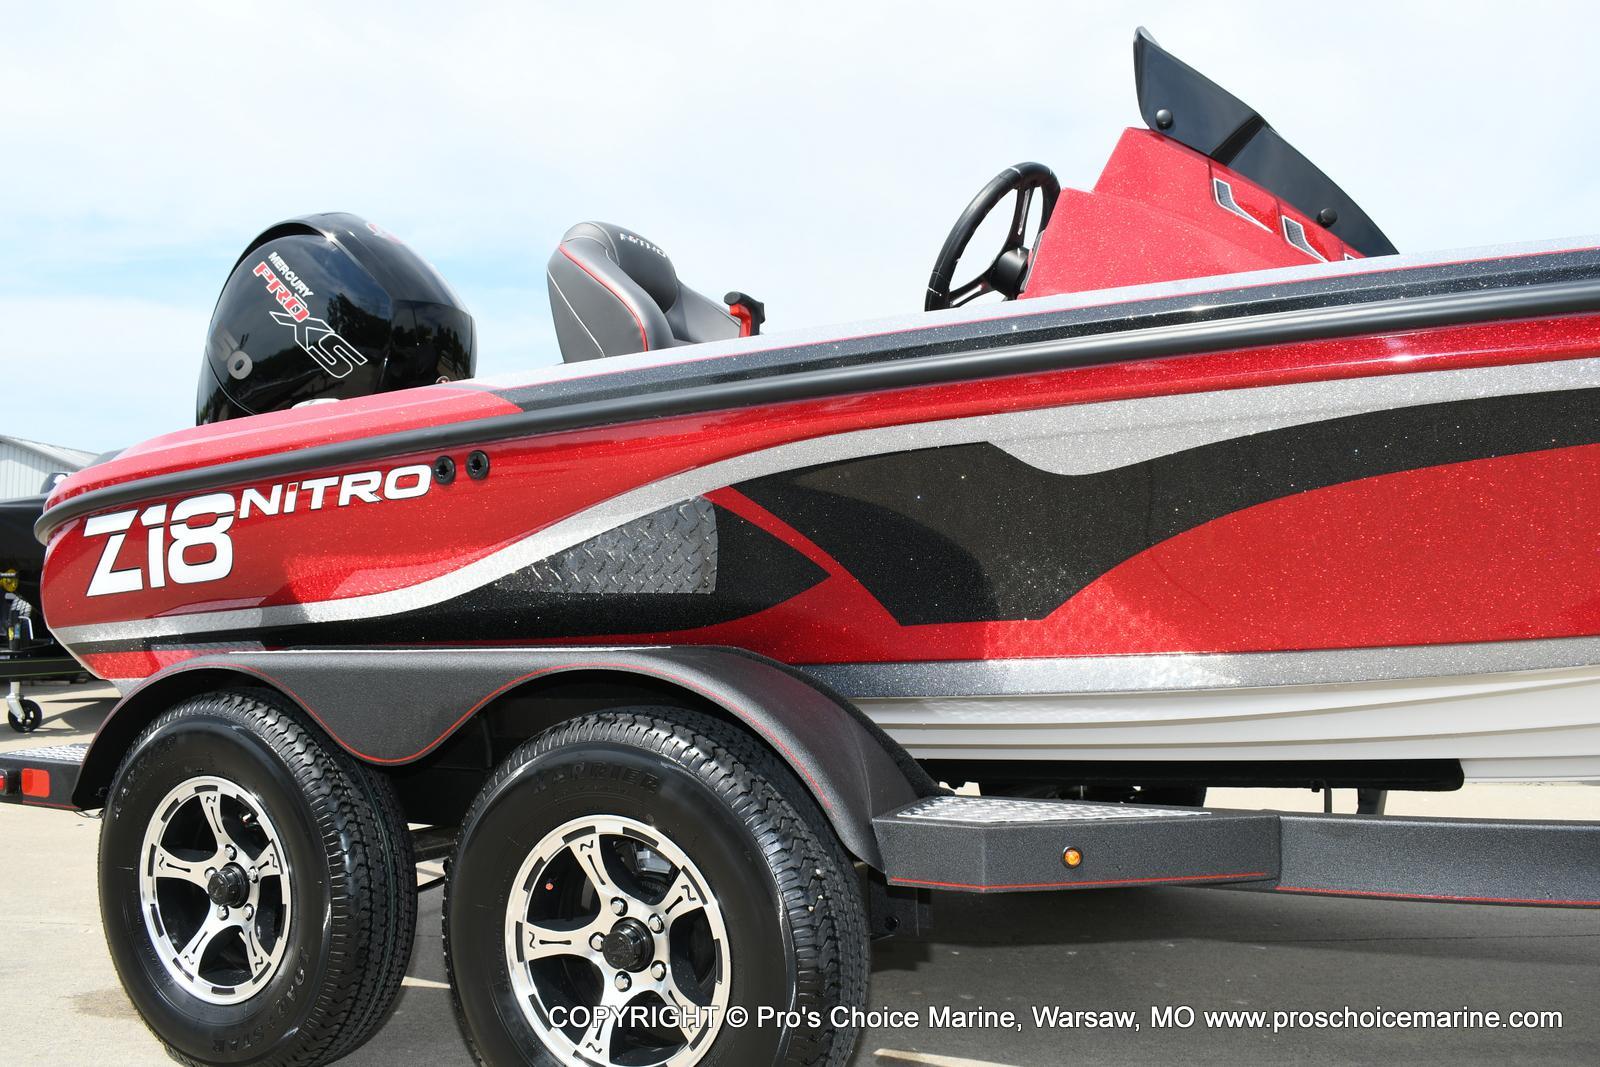 2020 Nitro boat for sale, model of the boat is Z18 & Image # 34 of 50